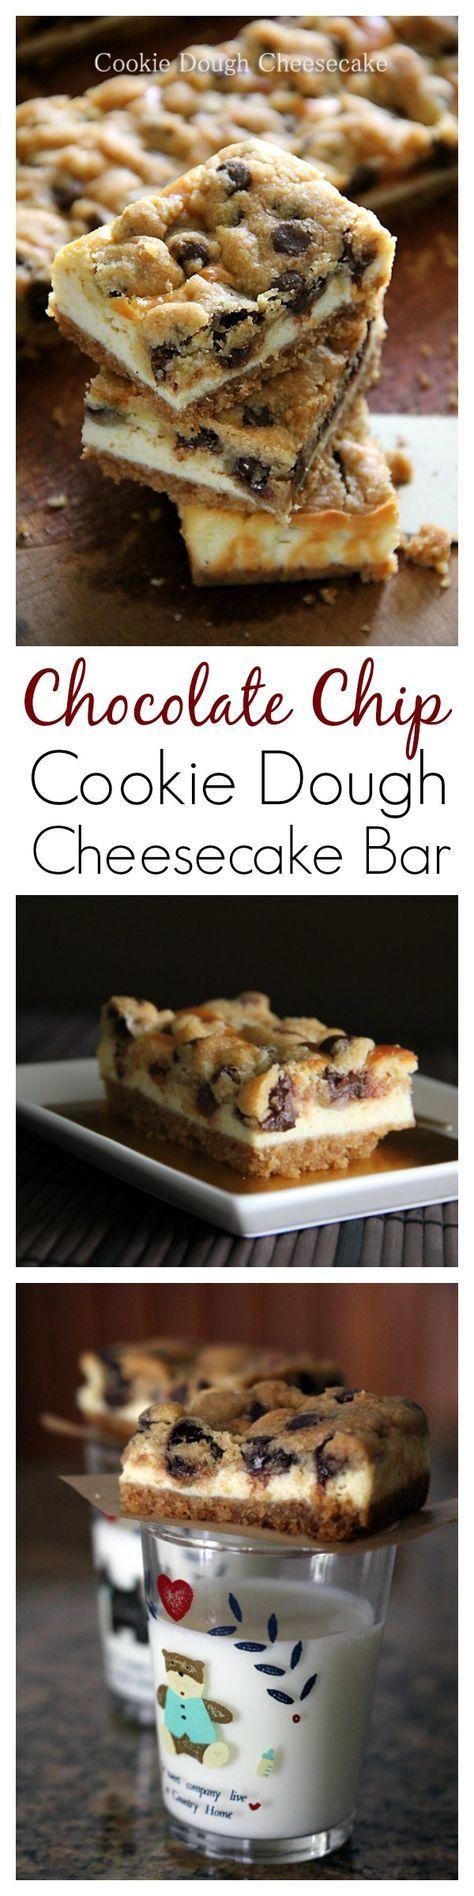 Chocolate Chip Cookie Dough Cheesecake Bar recipe, the BEST cheesecake bar EVER | http://rasamalaysia.com